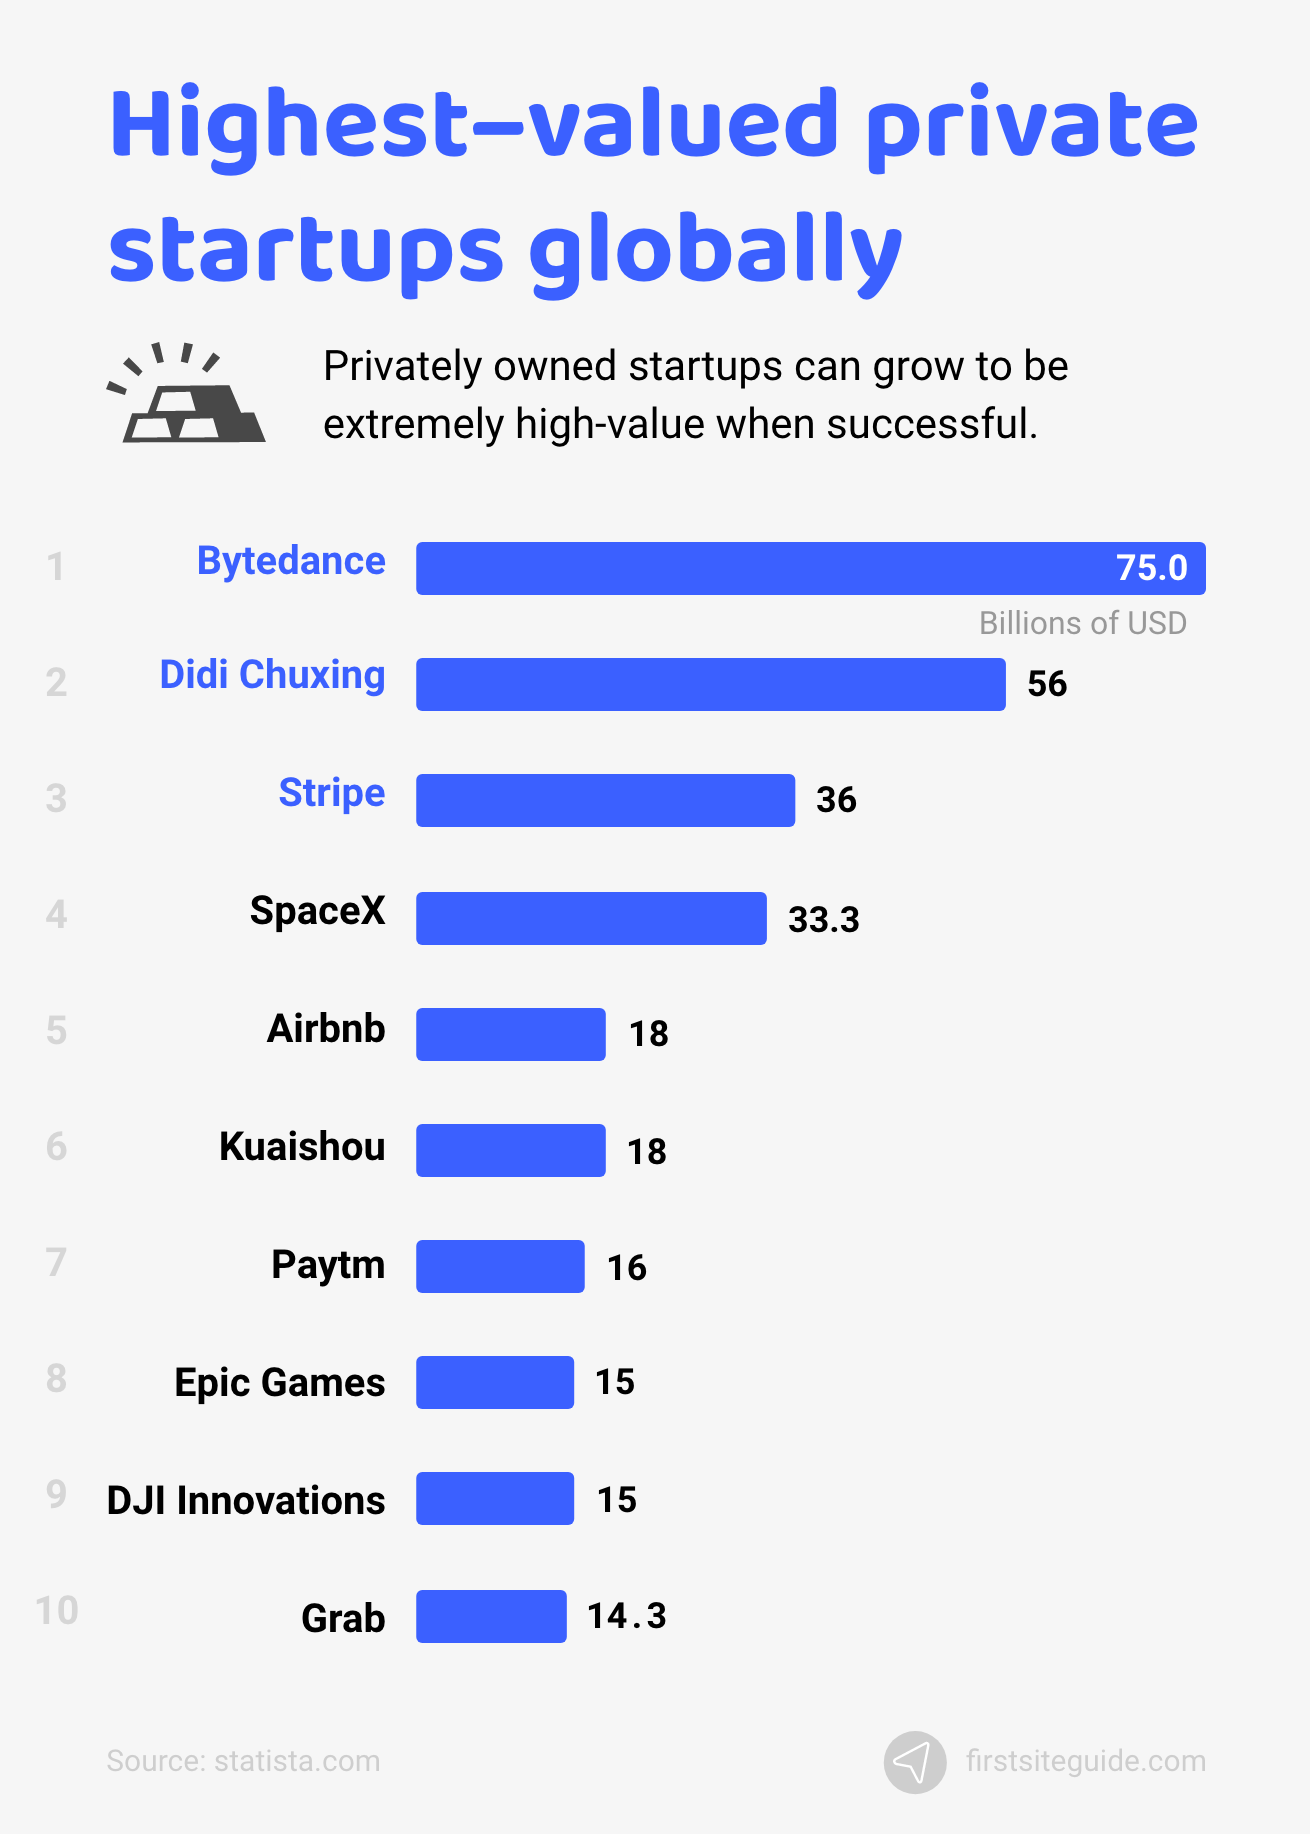 Highest–valued private startups globally